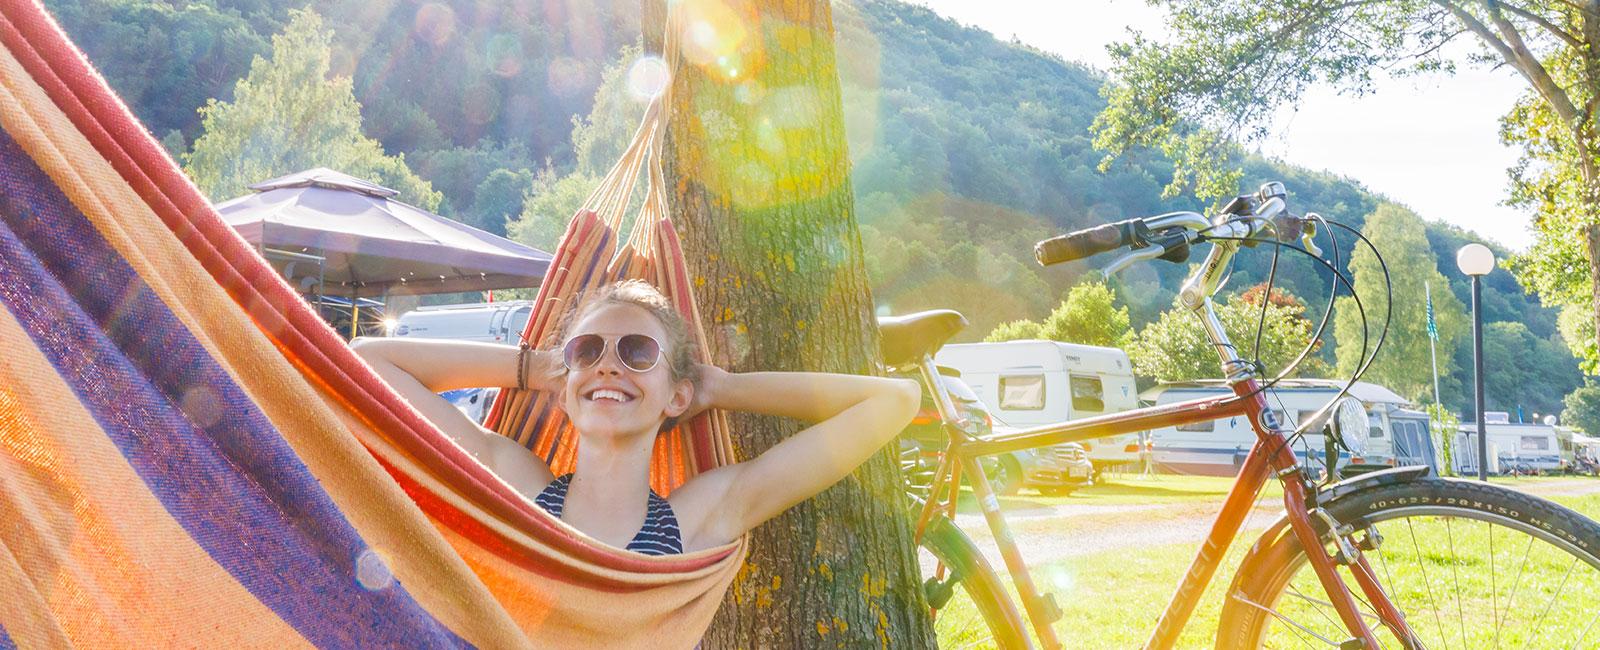 Relaxen auf dem Campingplatz